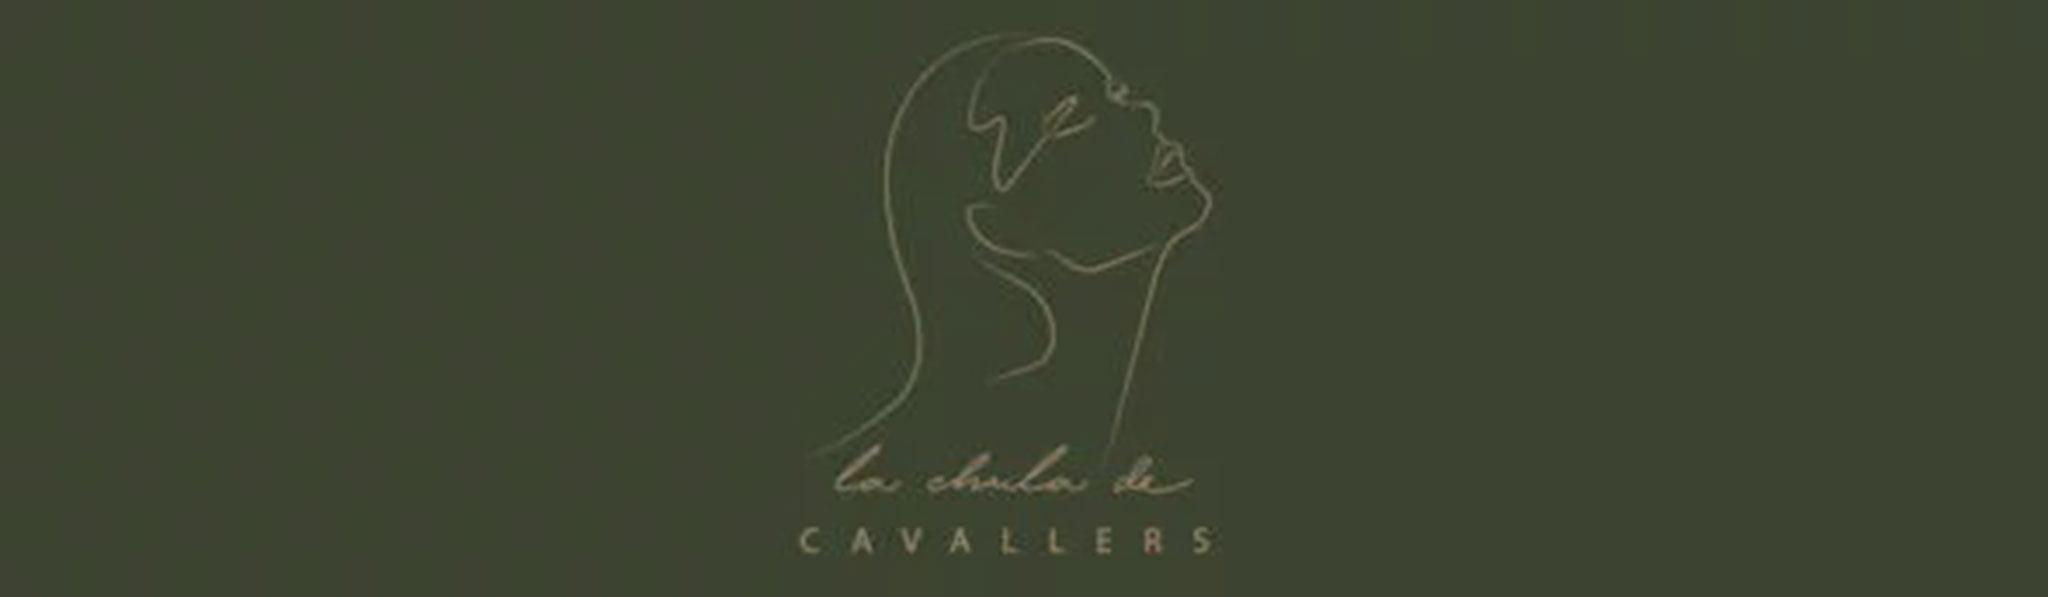 Logo La Chula de Cavallers